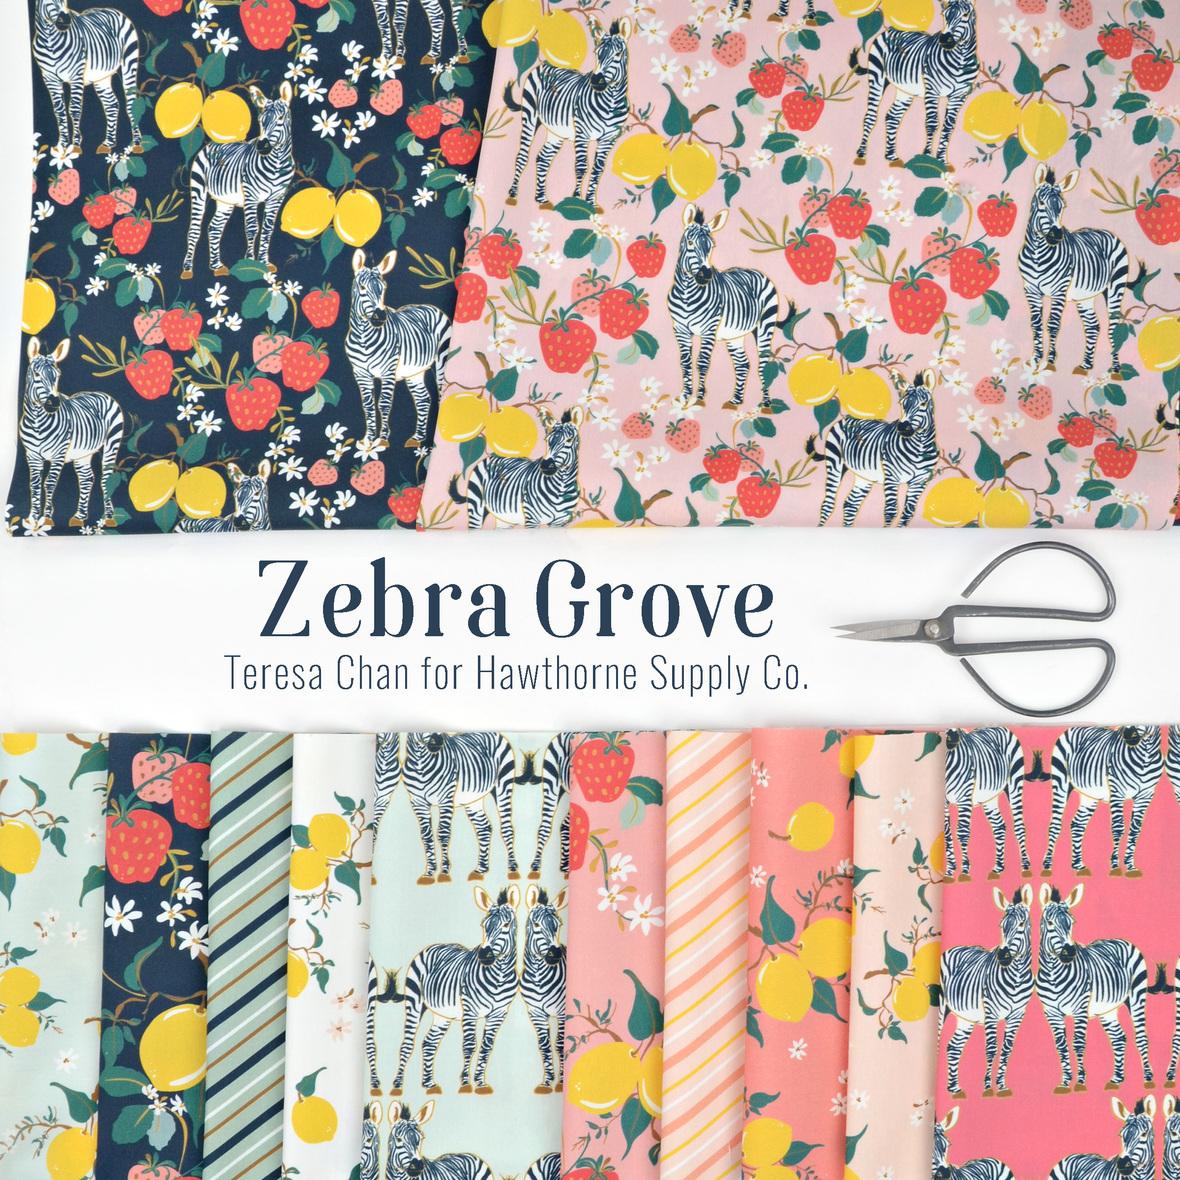 Zebra-Grove-fabric-Teresa-Chan-for-Hawthorne-Supply-Co